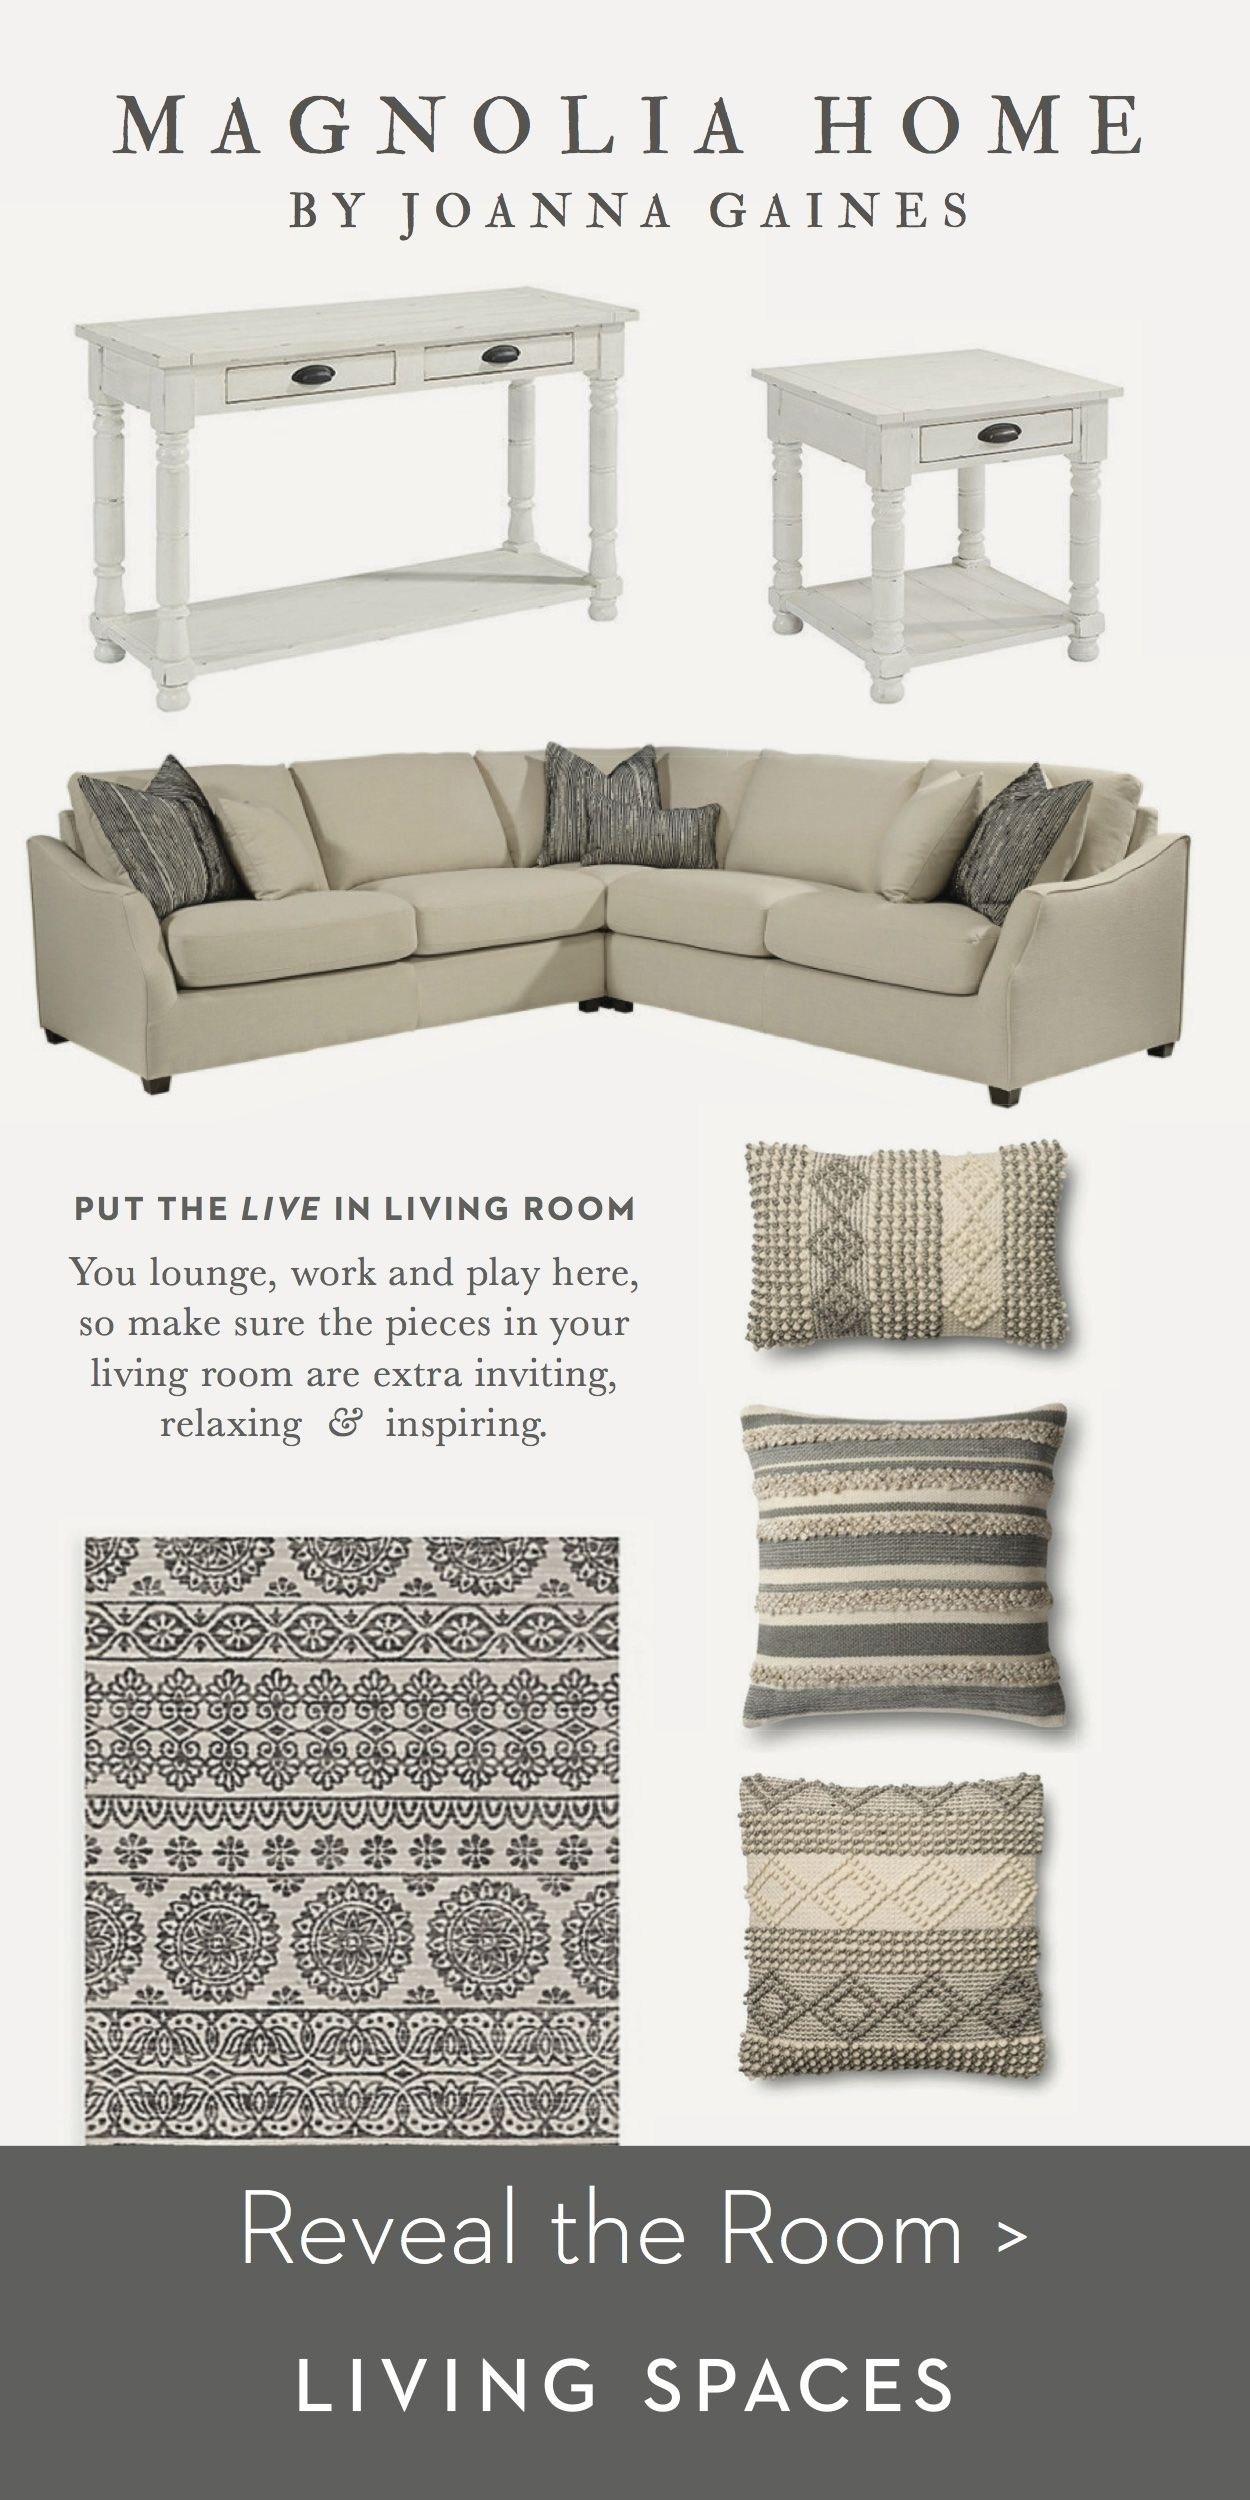 Magnolia Homejoanna Gaines| Living Room Inspiration (Image 24 of 25)